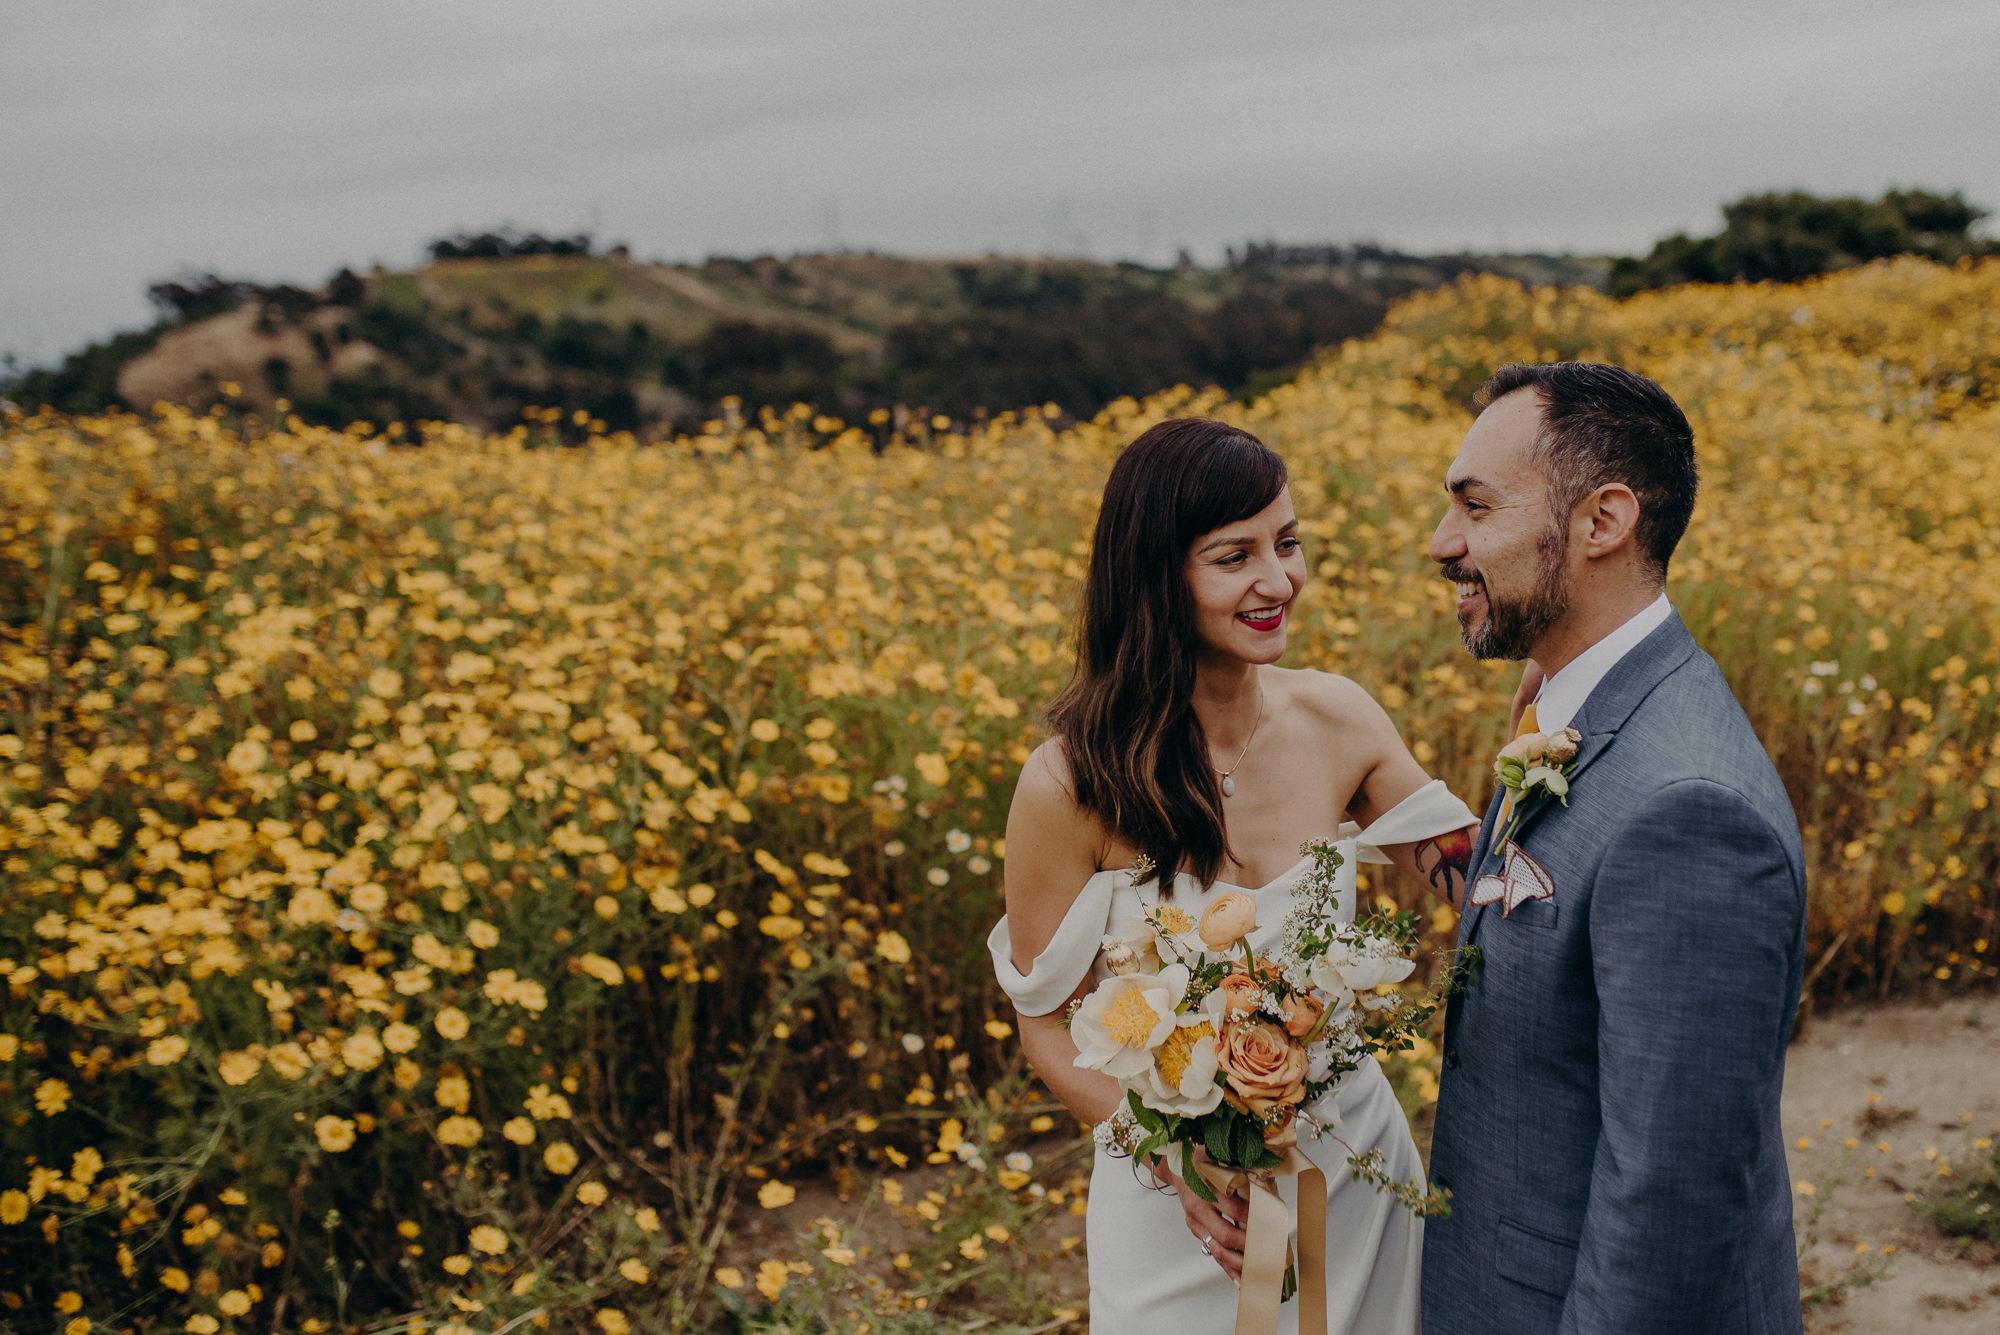 elopement photographer in los angeles - la wedding photographer - isaiahandtaylor.com-031.jpg